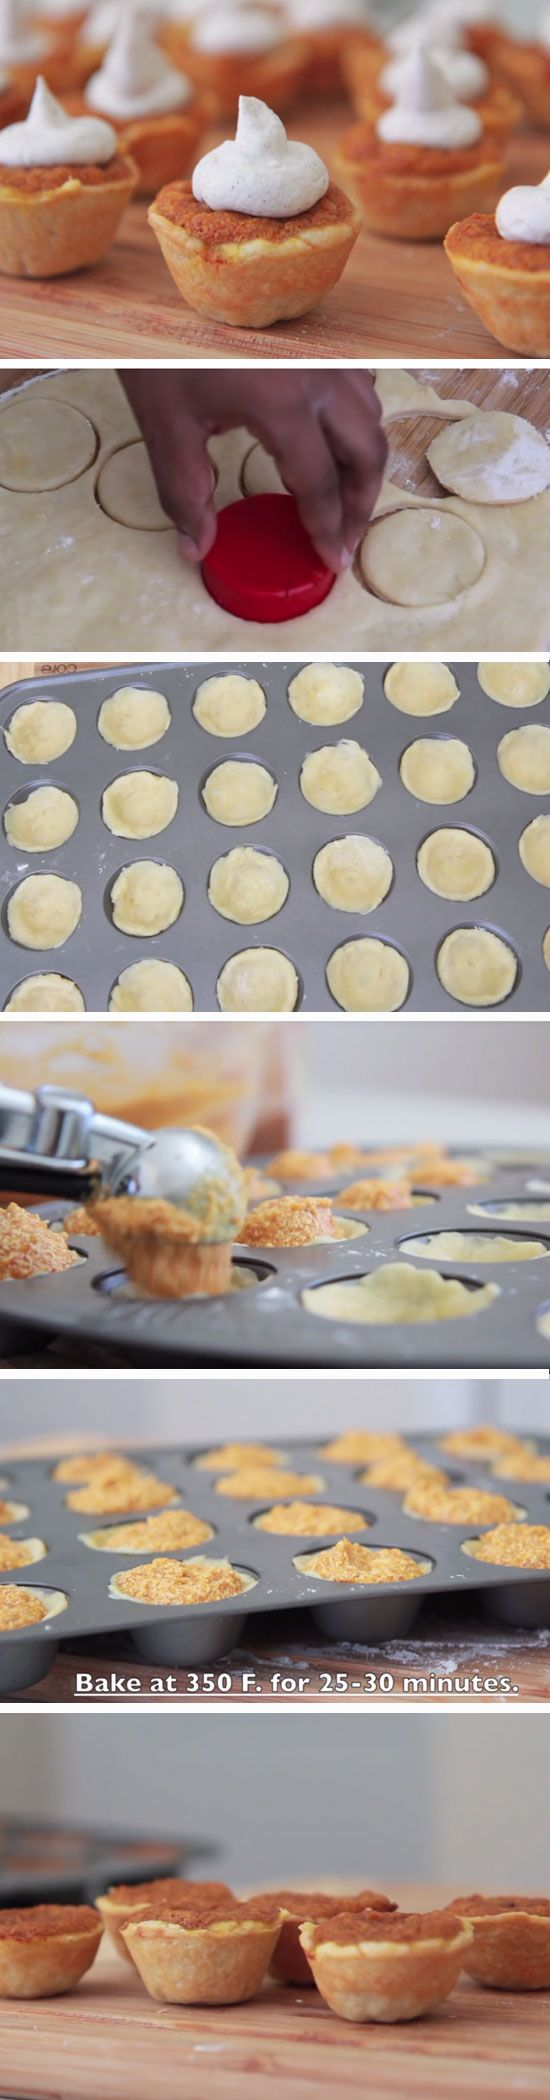 Mini Pumpkin Pie Bites | DIY Fall Baby Shower Ideas for Boys